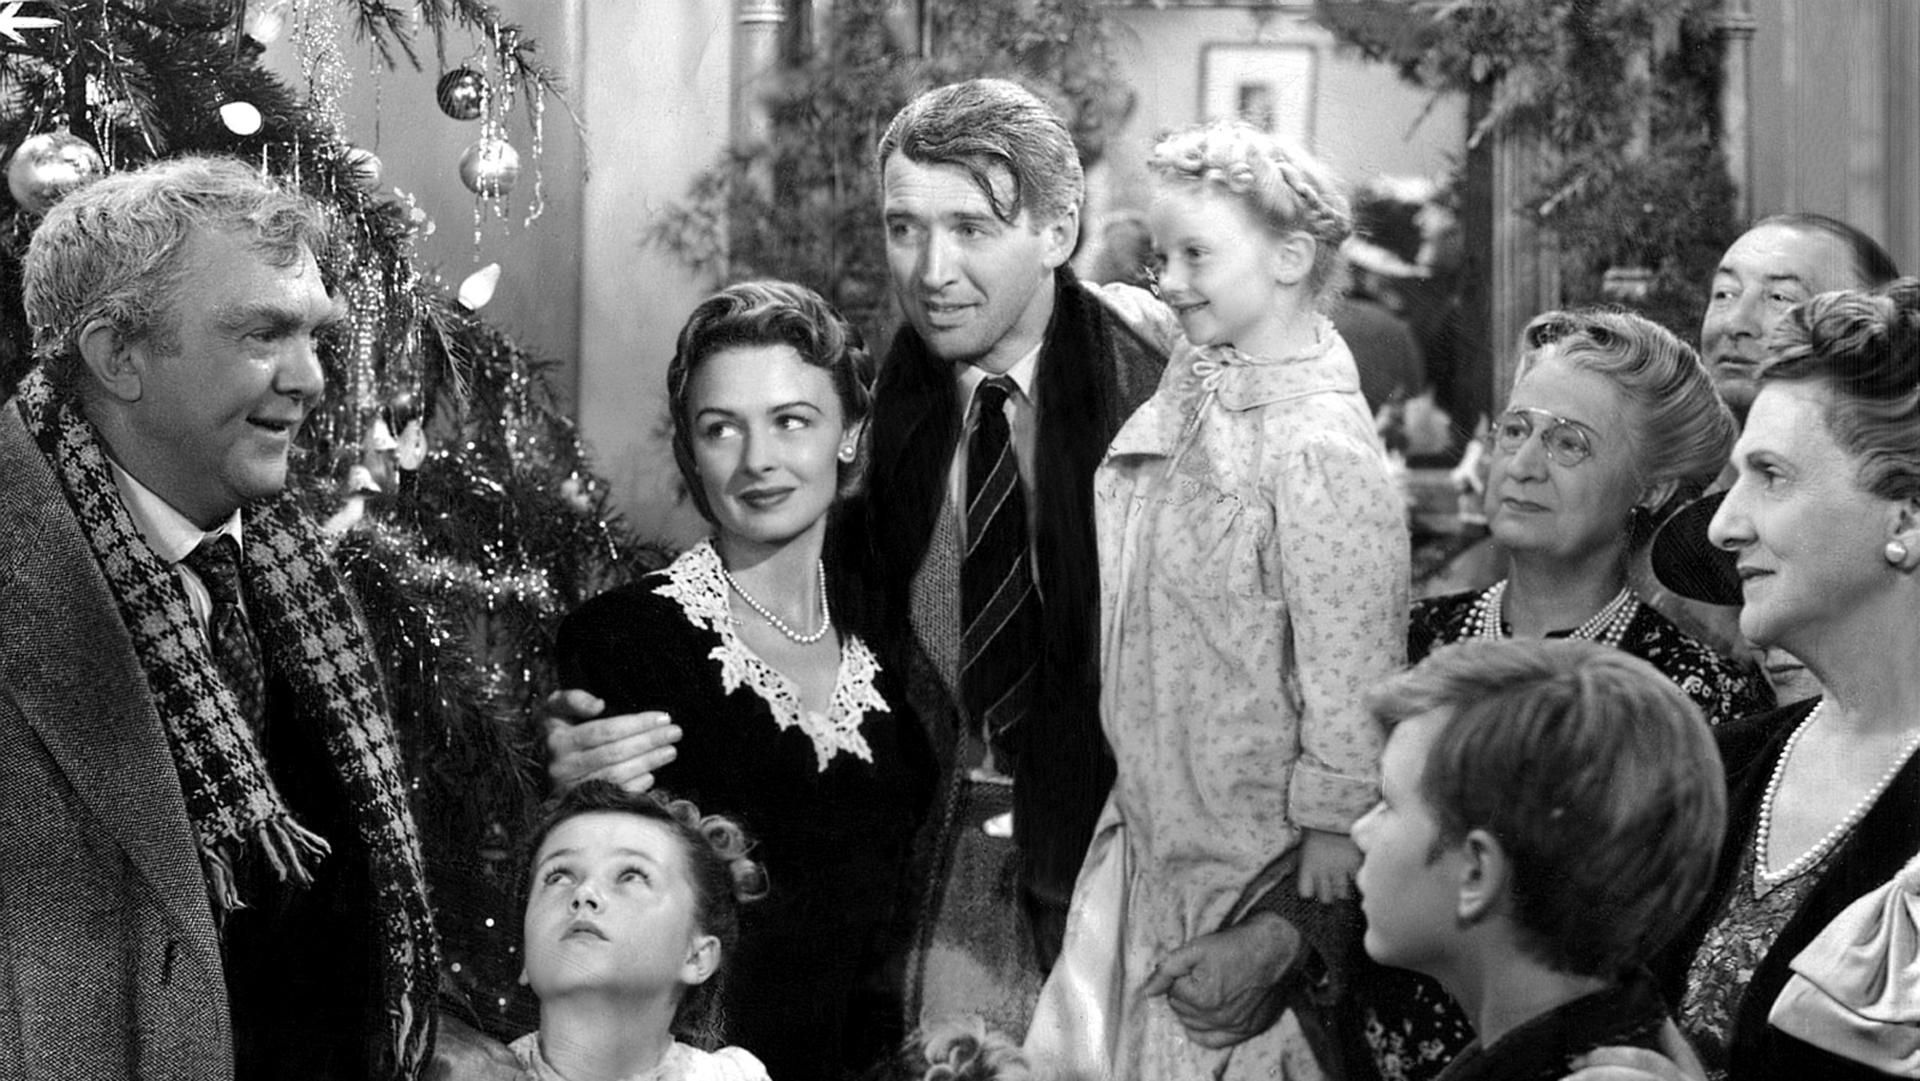 It's a wonderful life, F. Capra,1946